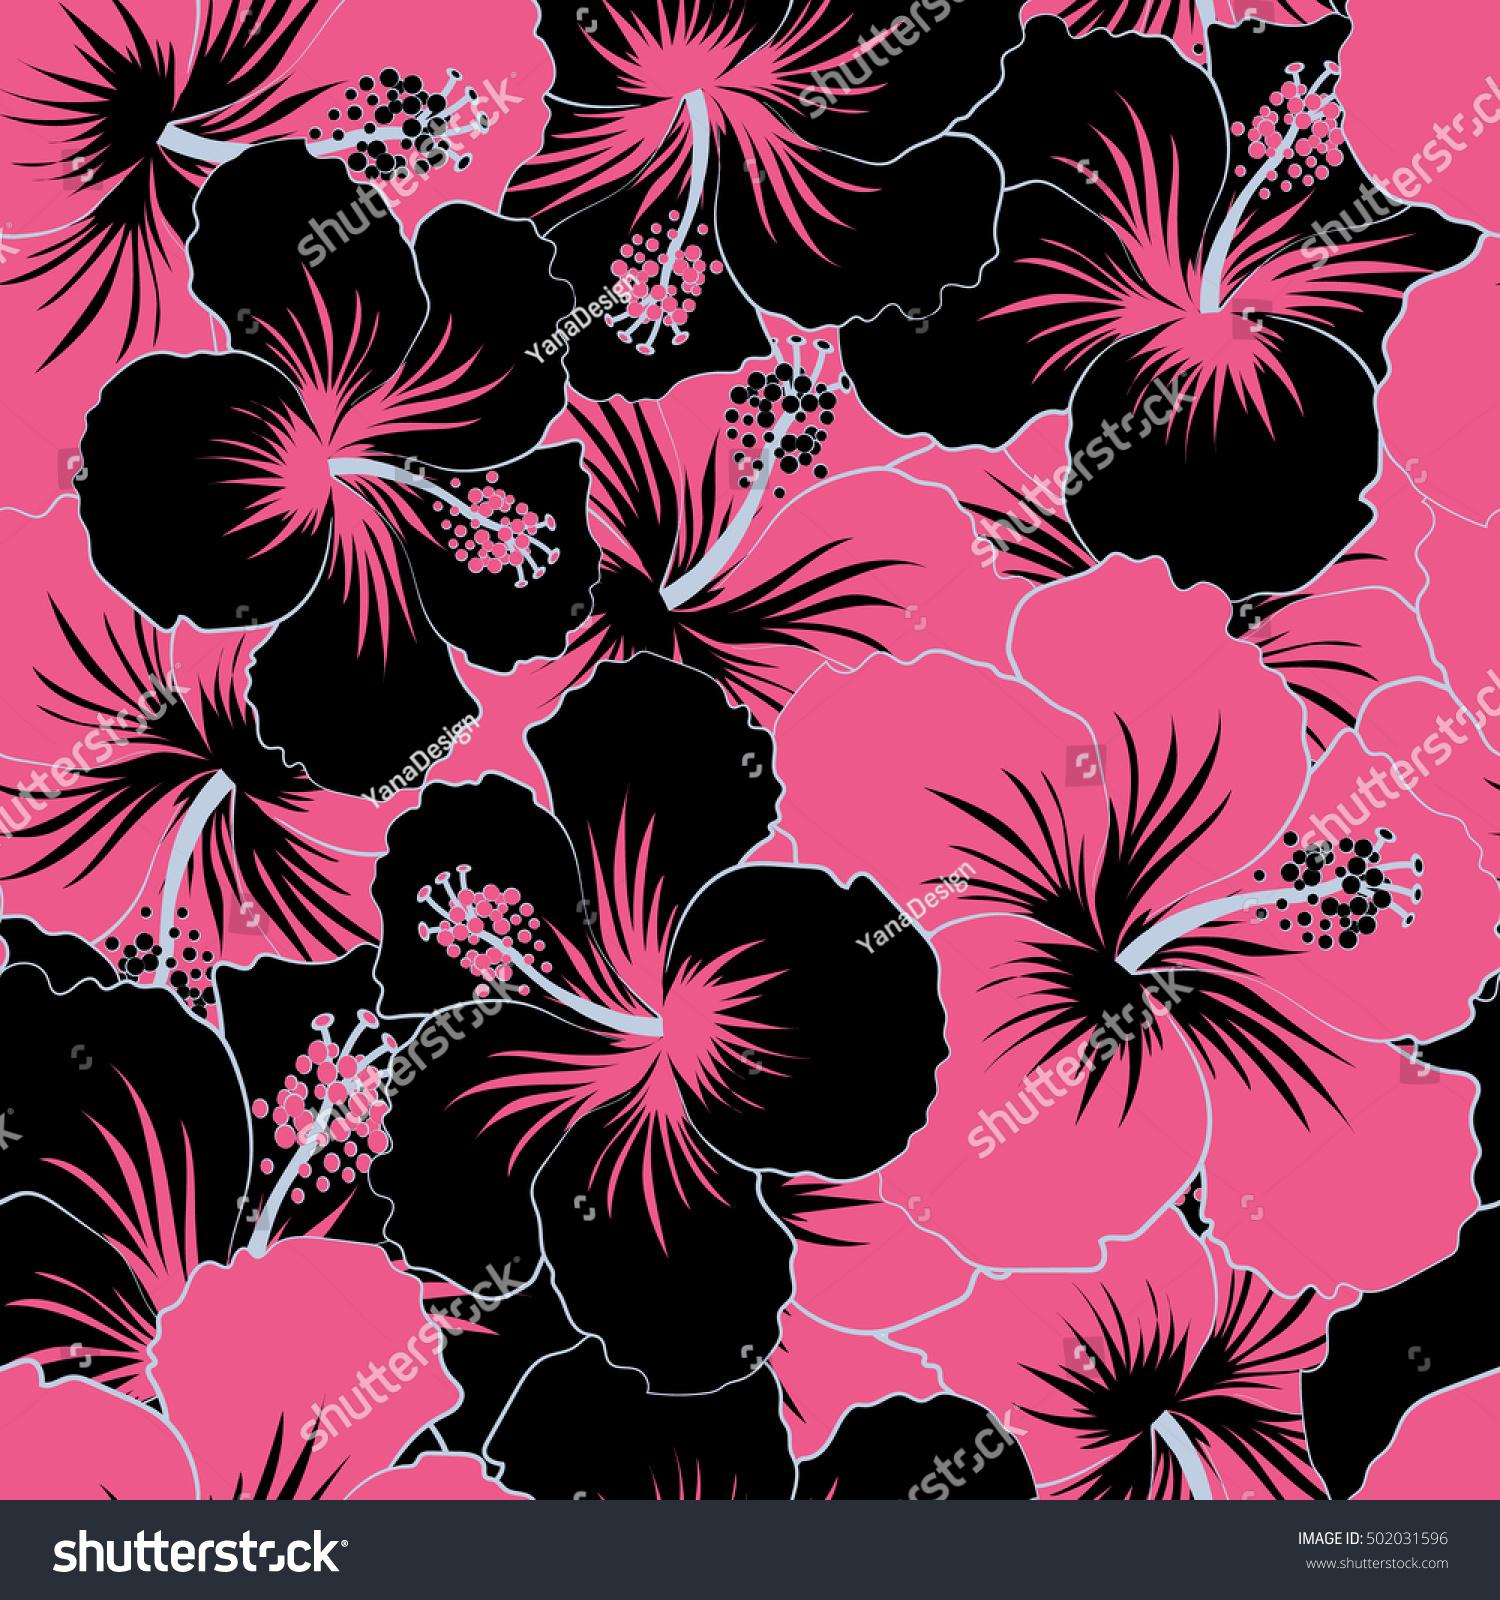 Sc Design Stoelen.Tropical Floral Seamless Pattern Black Pink Stock Vector Royalty